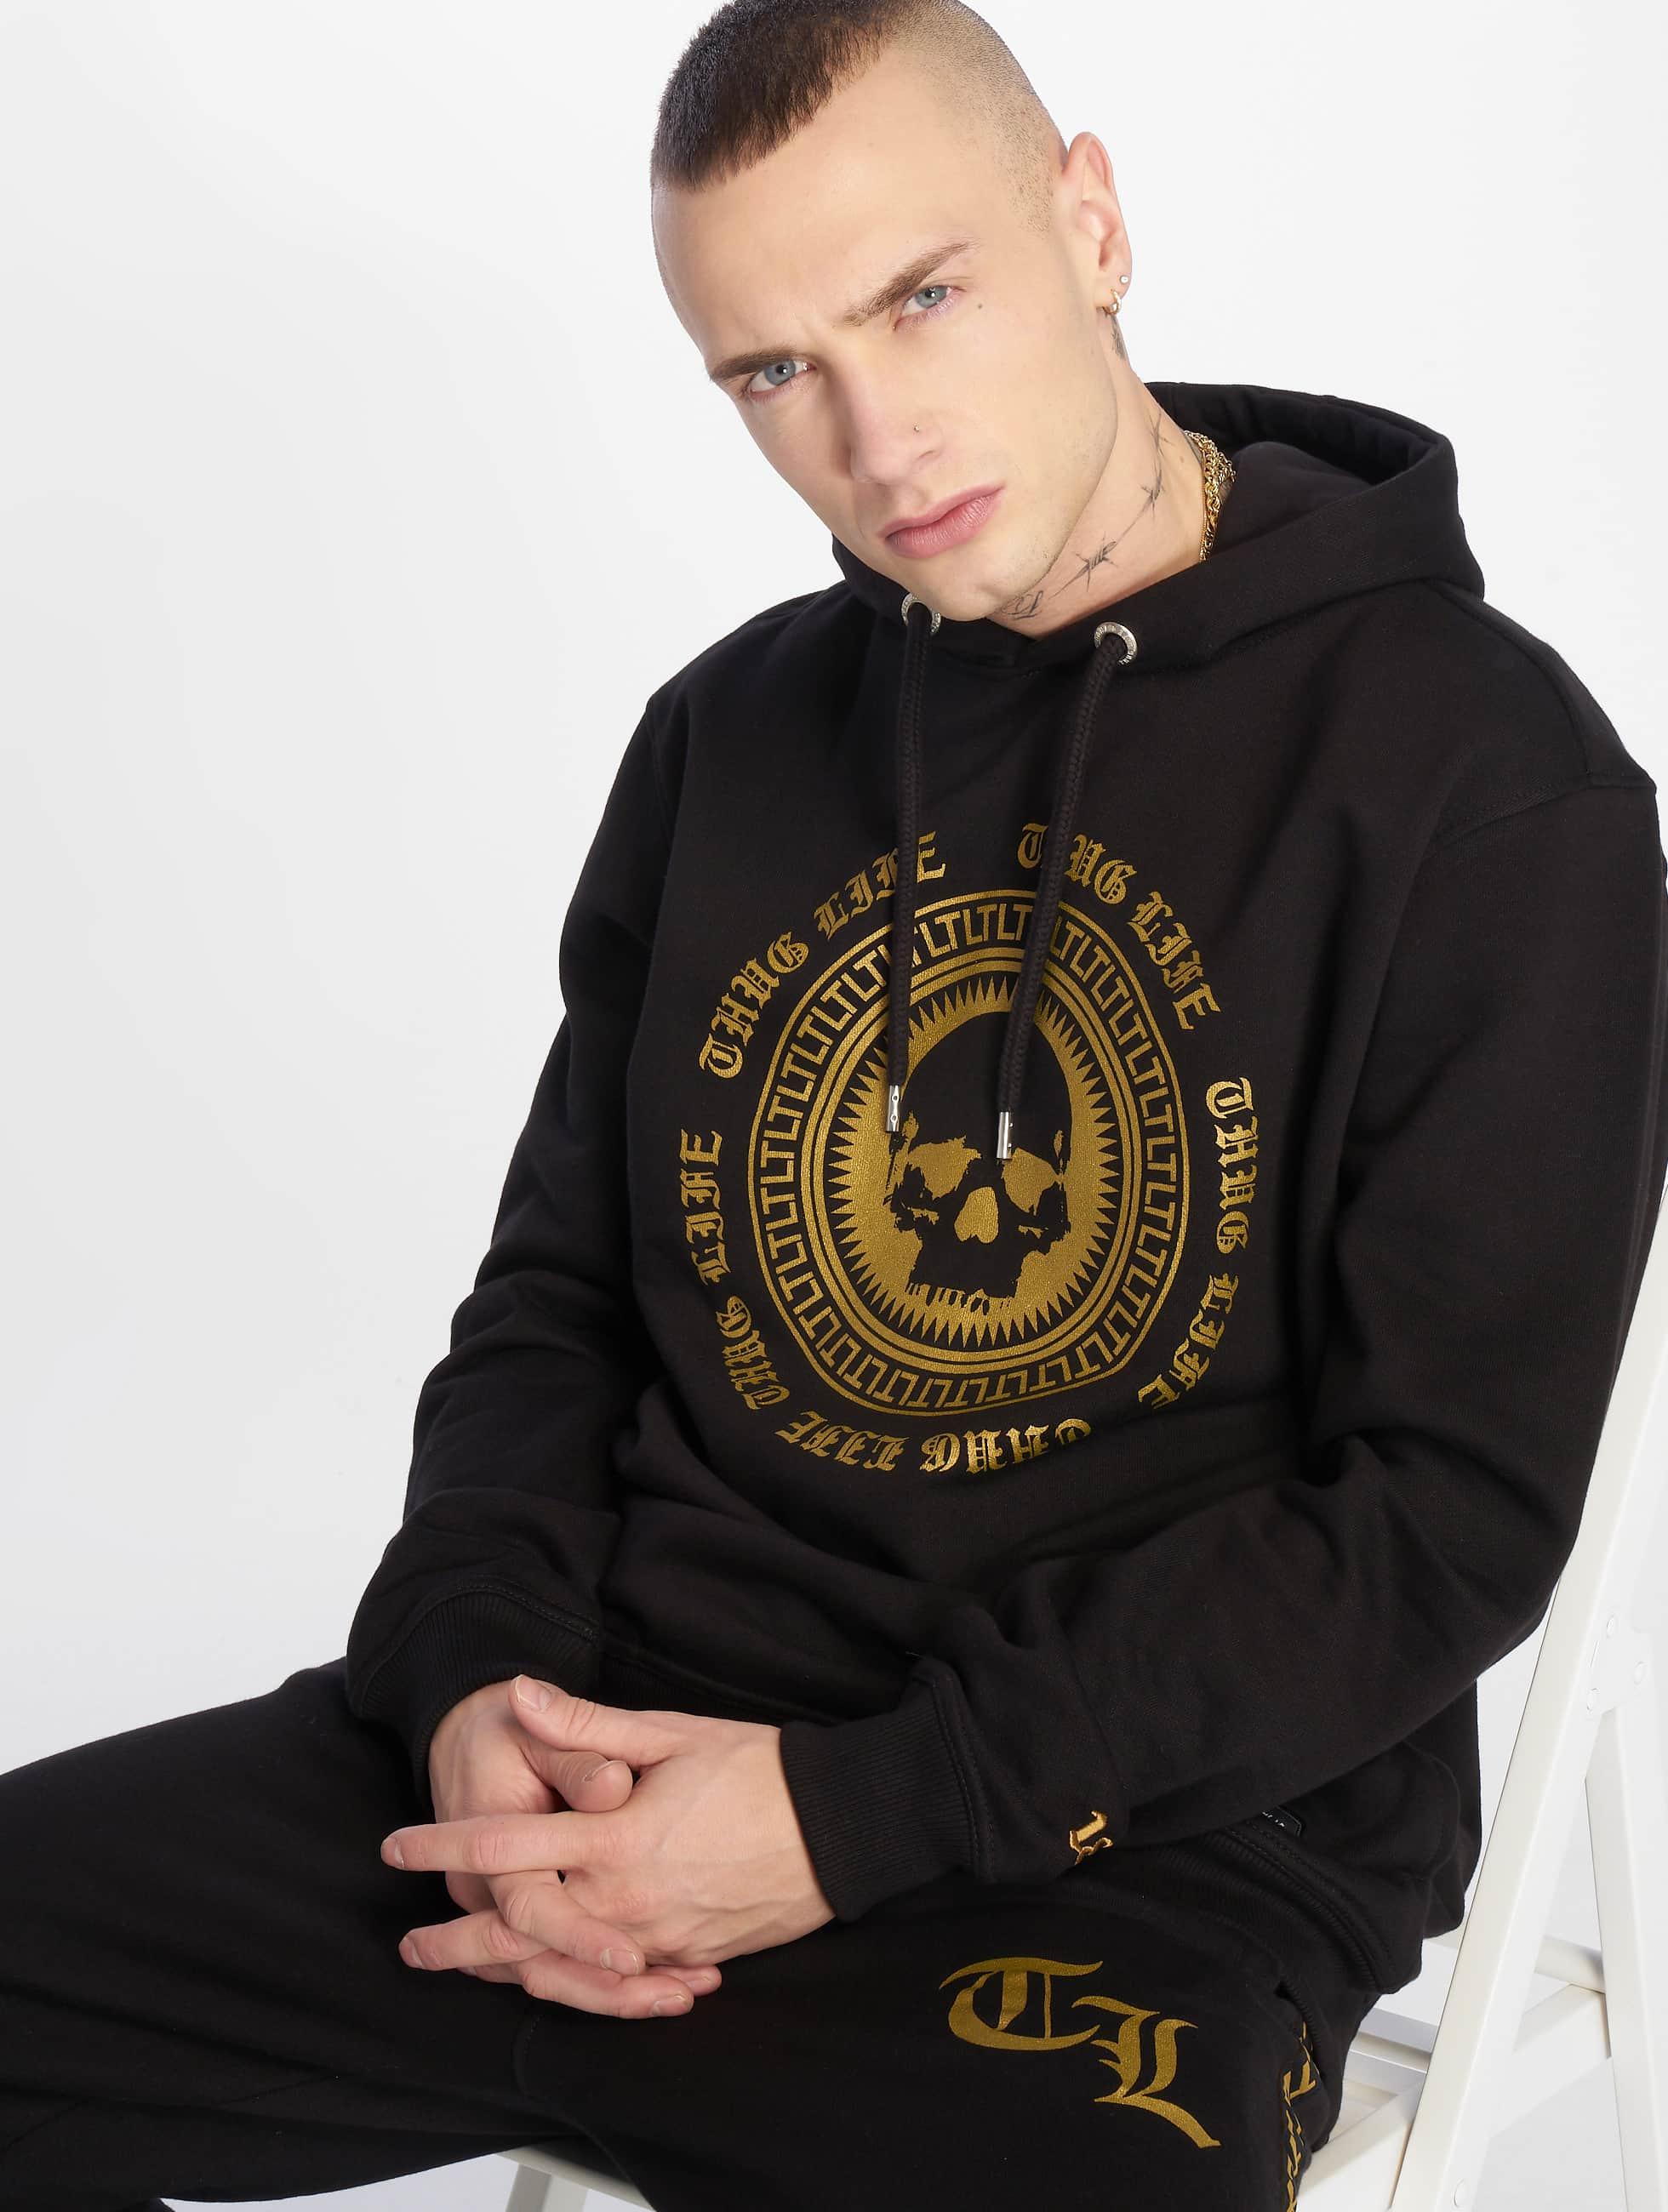 Thug Life / Hoodie Aggo in black XL